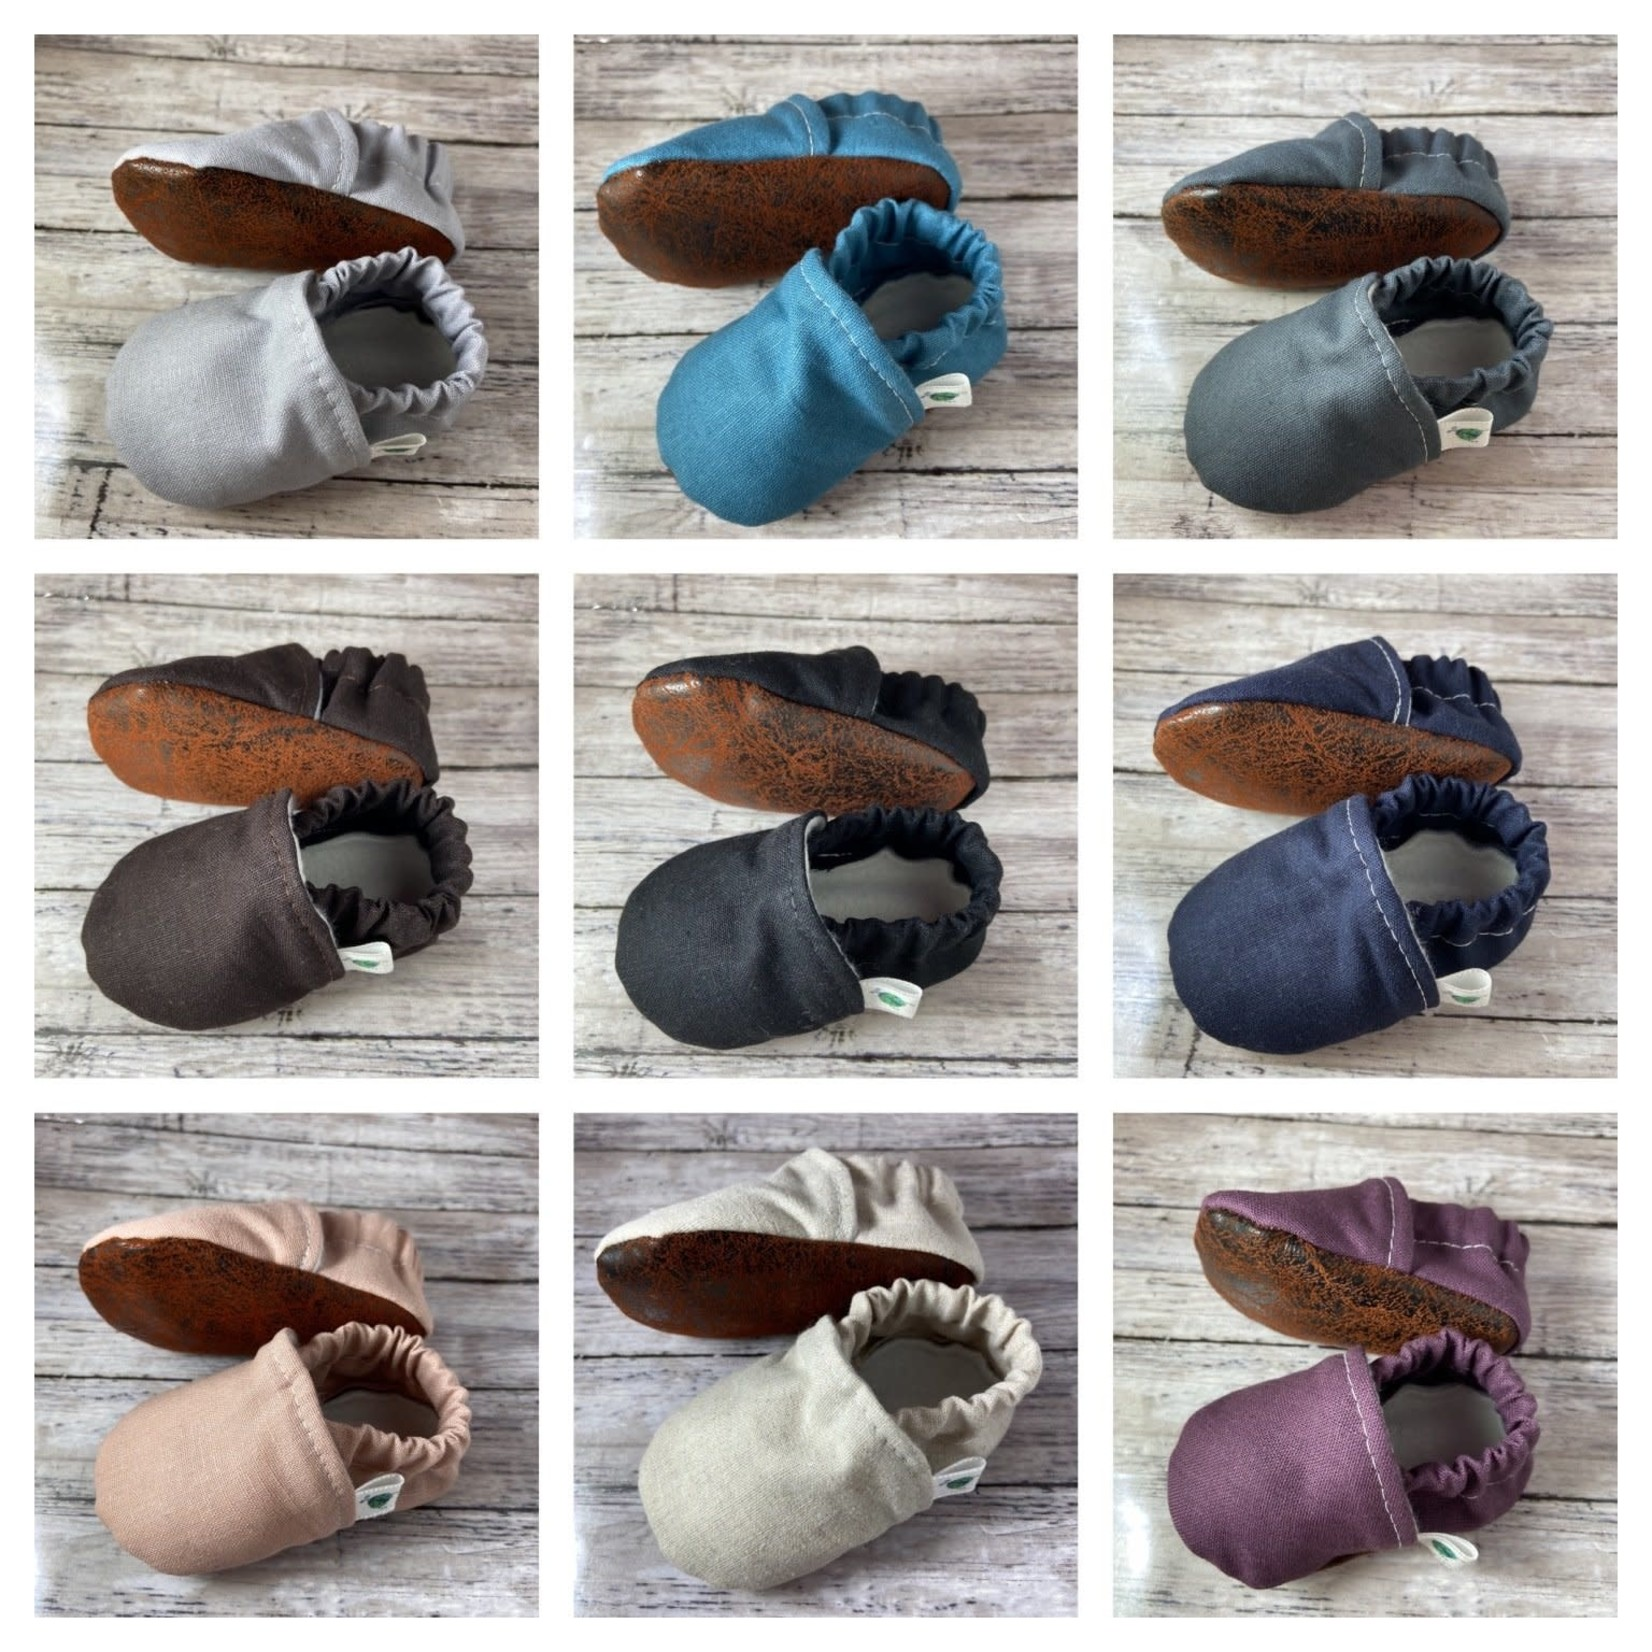 Lexiebugs 3-6m Baby Shoe